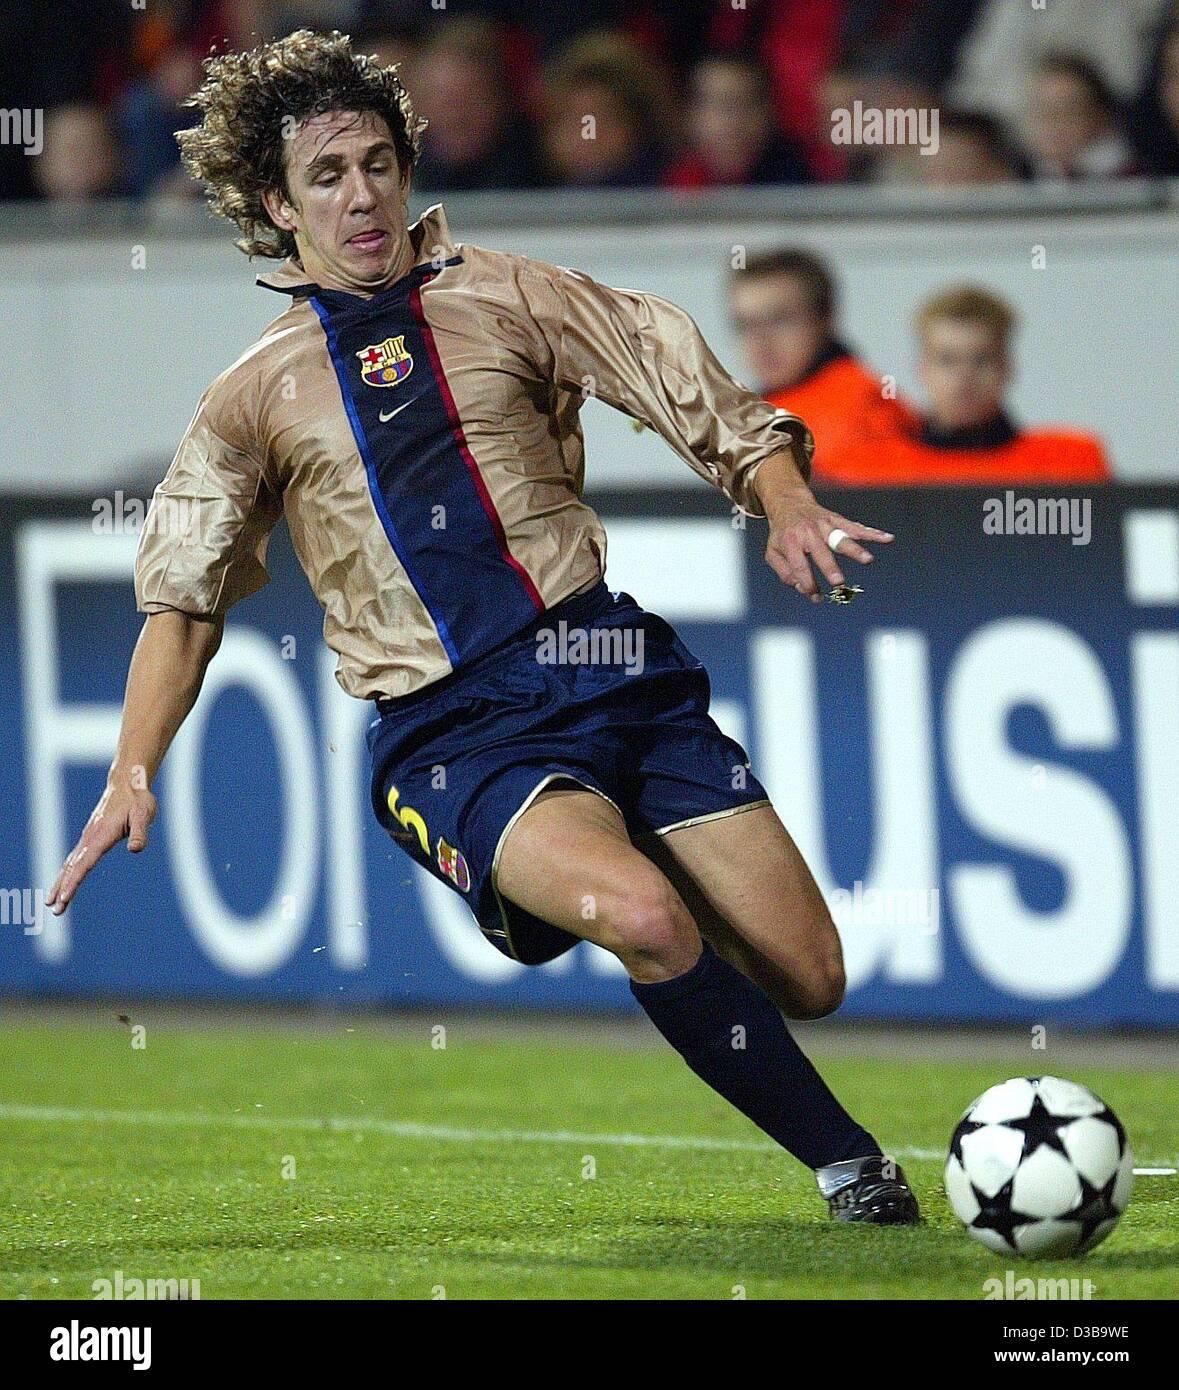 (dpa) - Barcelona's defender Carles Puyol kicks the ball during the UEFA Champions League match Bayer 04 Leverkusen - Stock Image